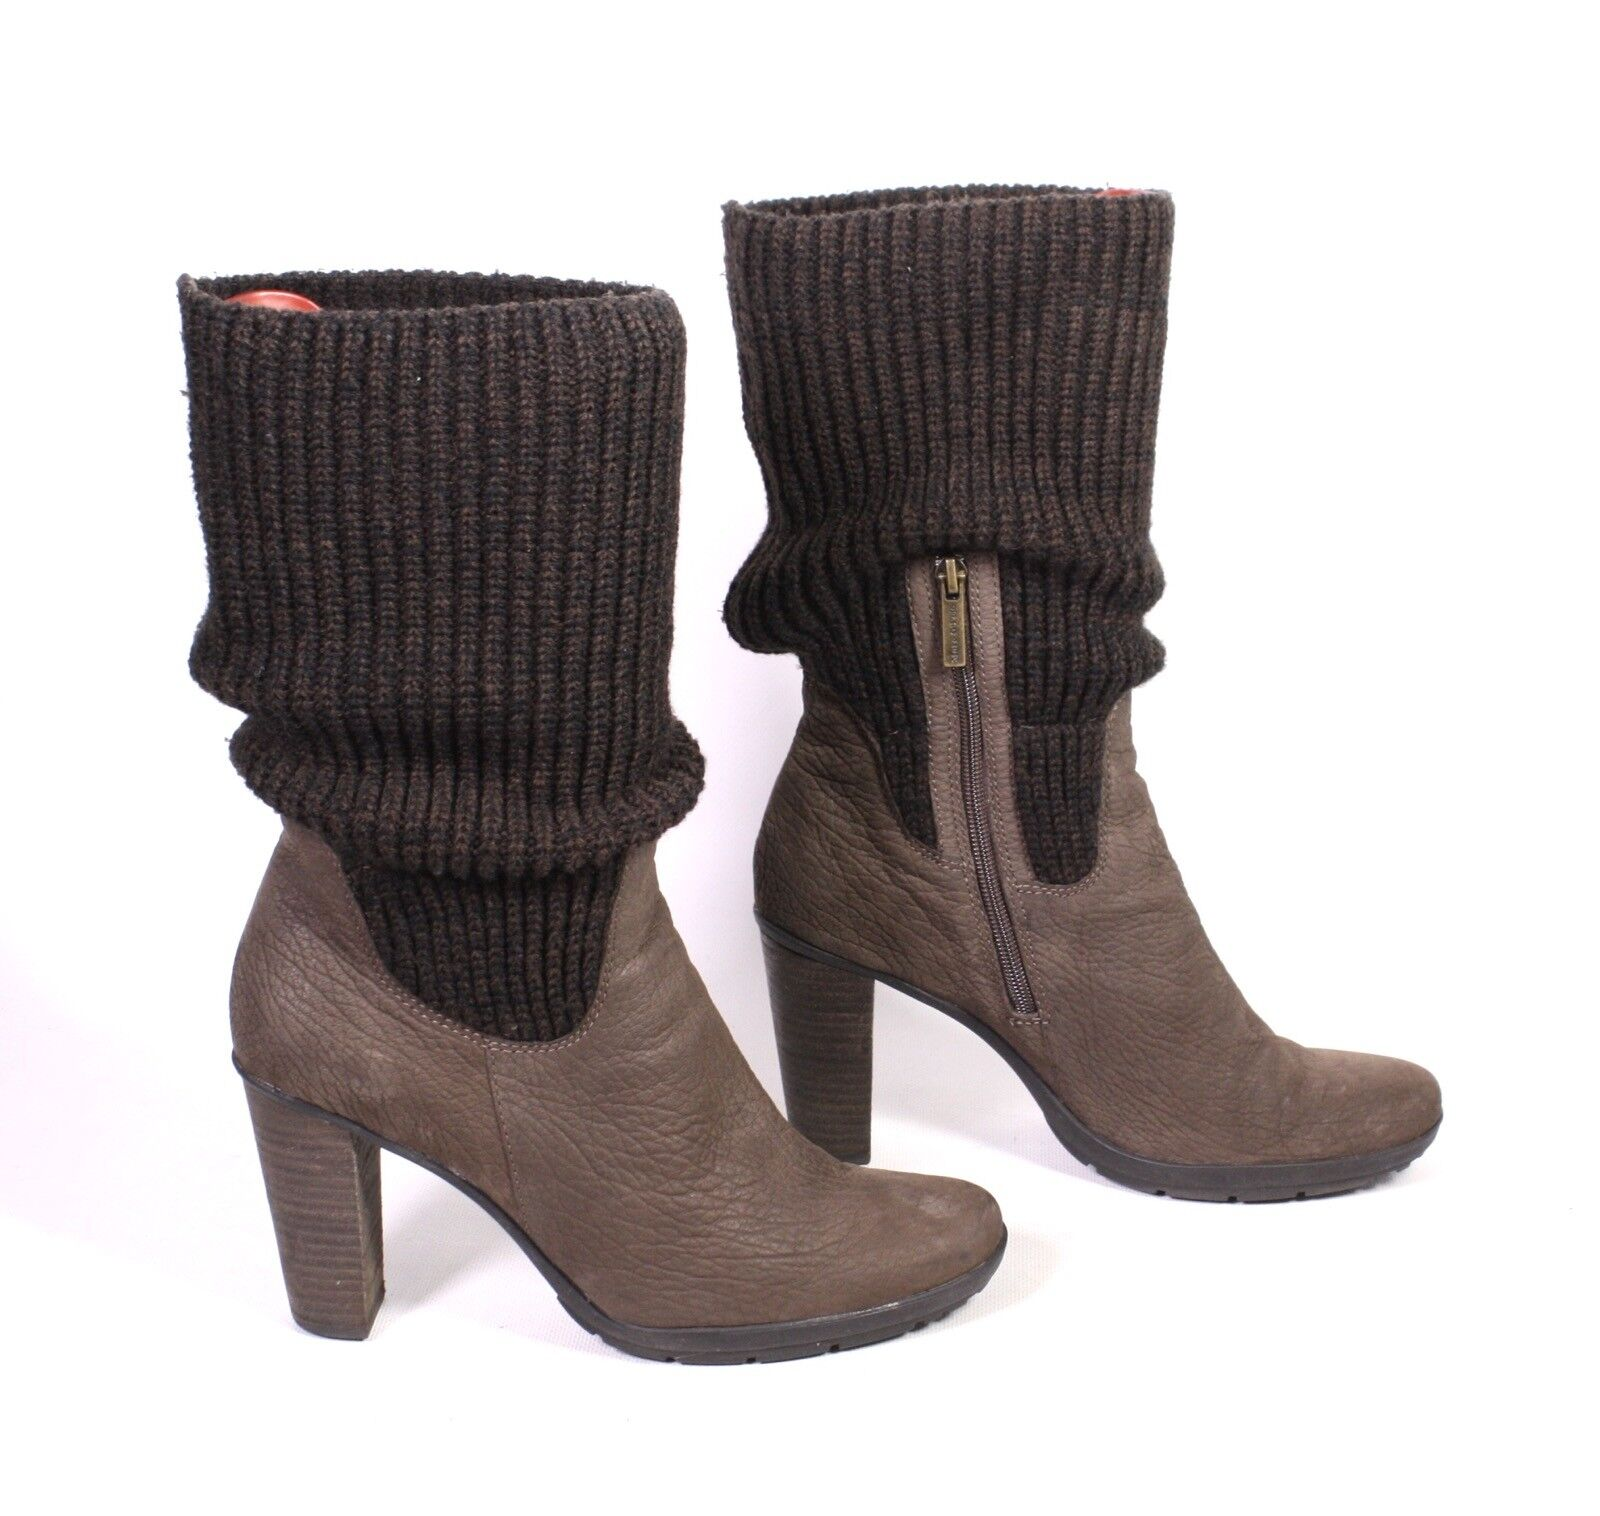 21S Marc O'Polo O'Polo O'Polo Damen Stiefel Sock-Boots Leder braun Gr. 40 (6,5) Strickbesatz 0af600